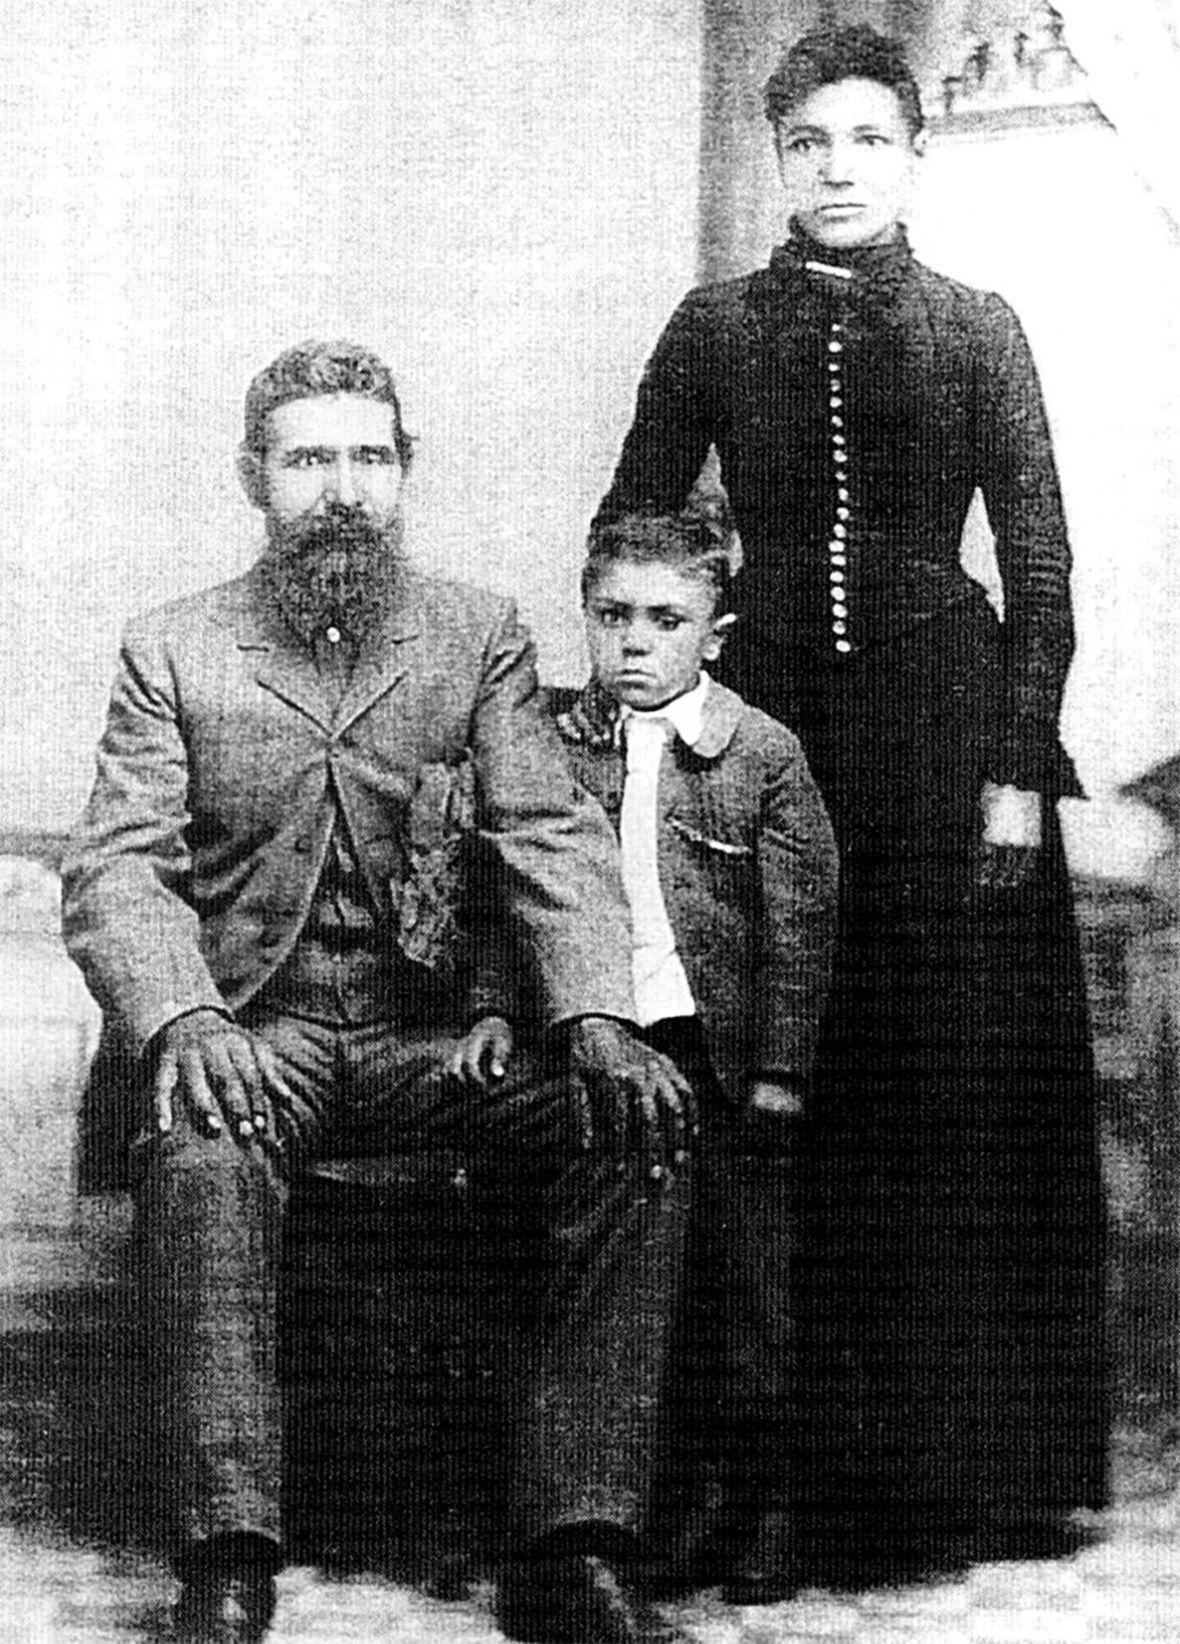 Martha Carson and family